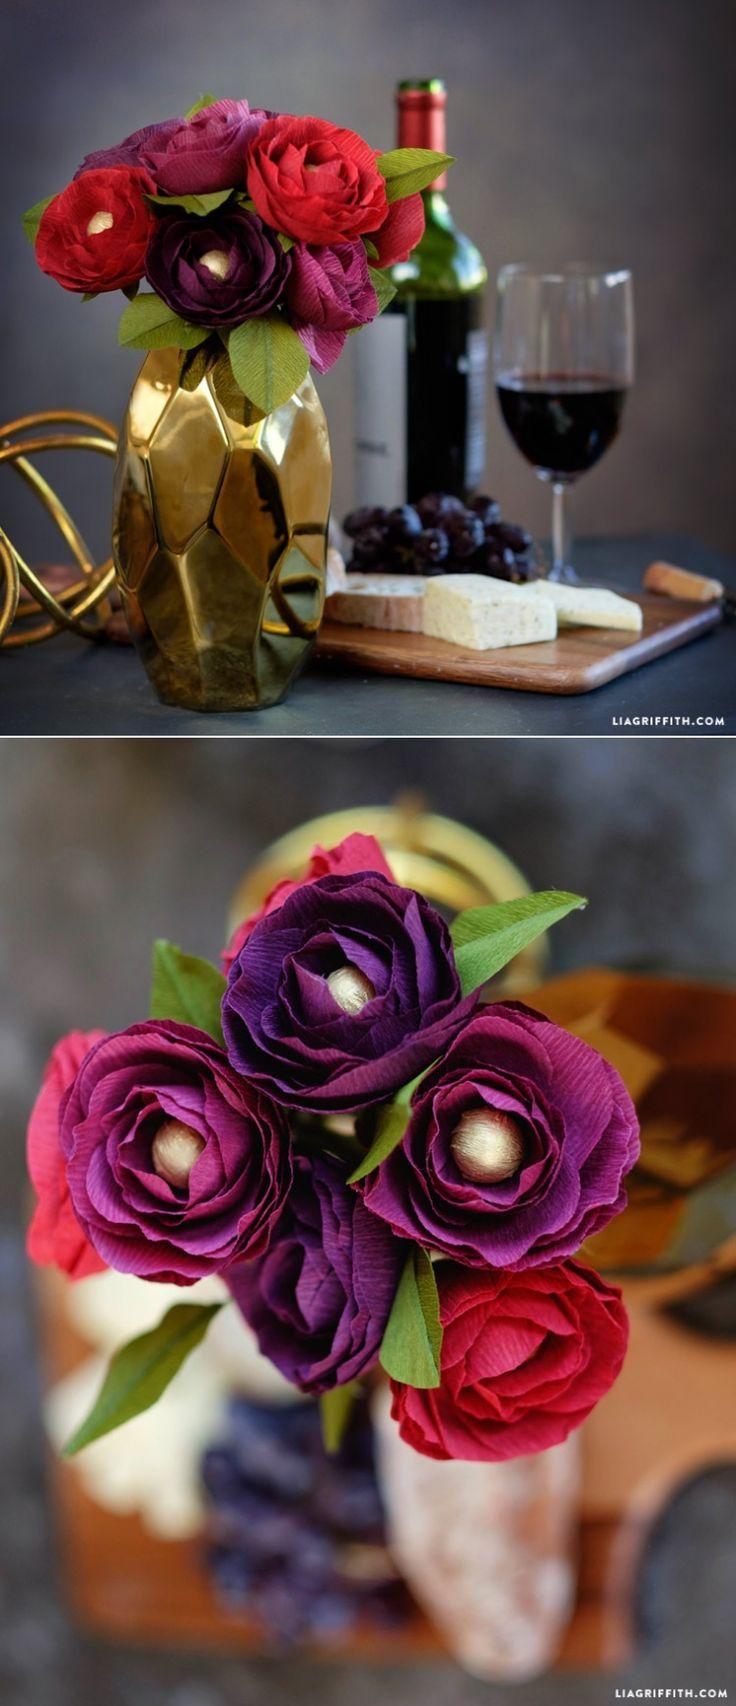 Crepe Paper Ranunculus  www.LiaGriffith.com: